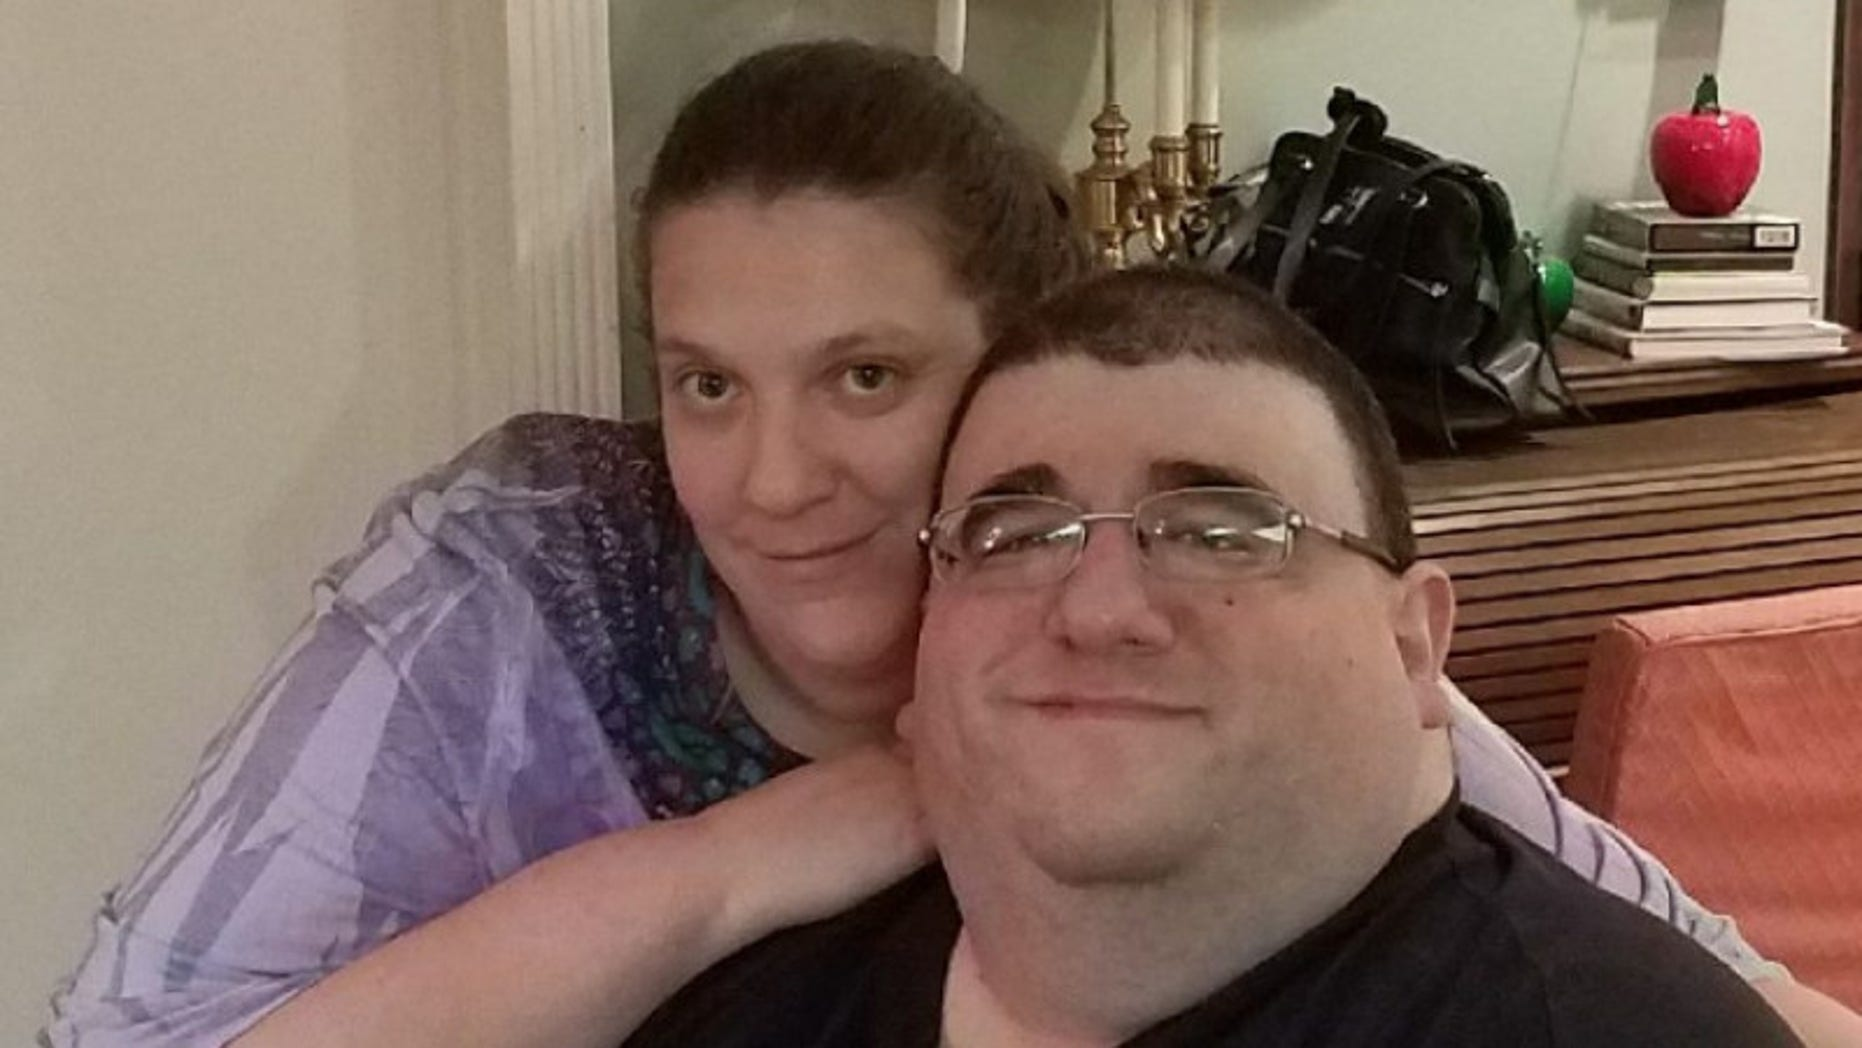 Robert Buchel and his fiancee Kathryn.